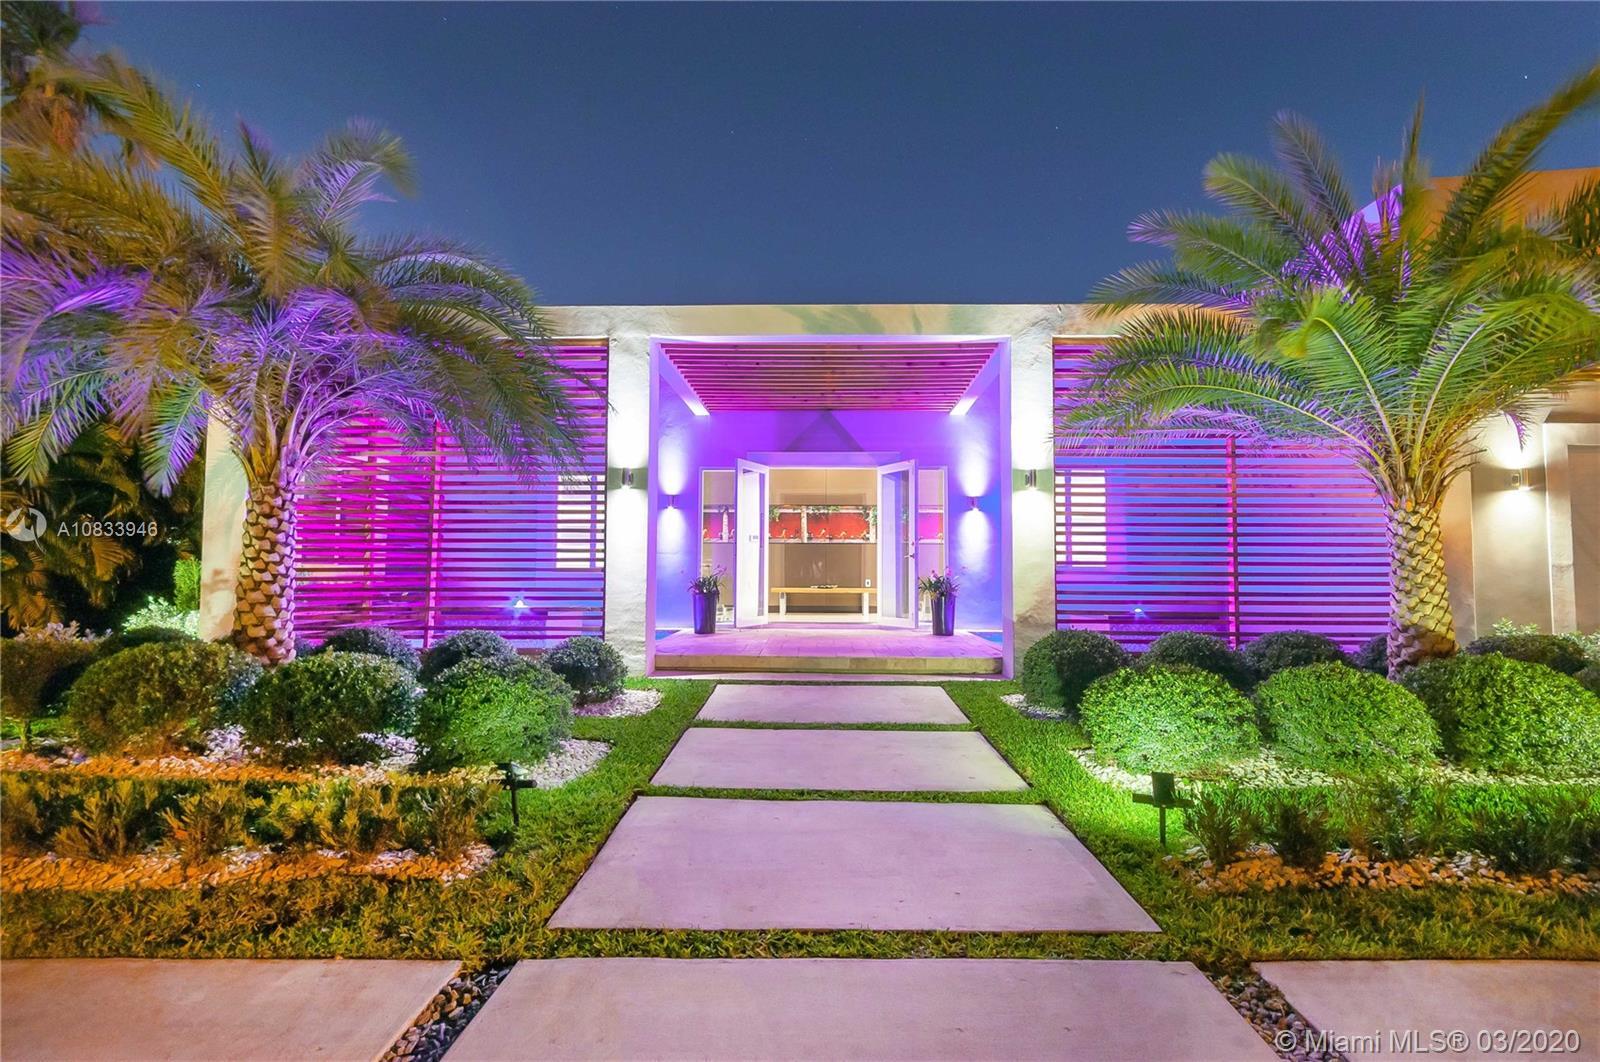 11900 Griffing Blvd, Biscayne Park, Florida 33161, 5 Bedrooms Bedrooms, ,5 BathroomsBathrooms,Residential,For Sale,11900 Griffing Blvd,A10833946